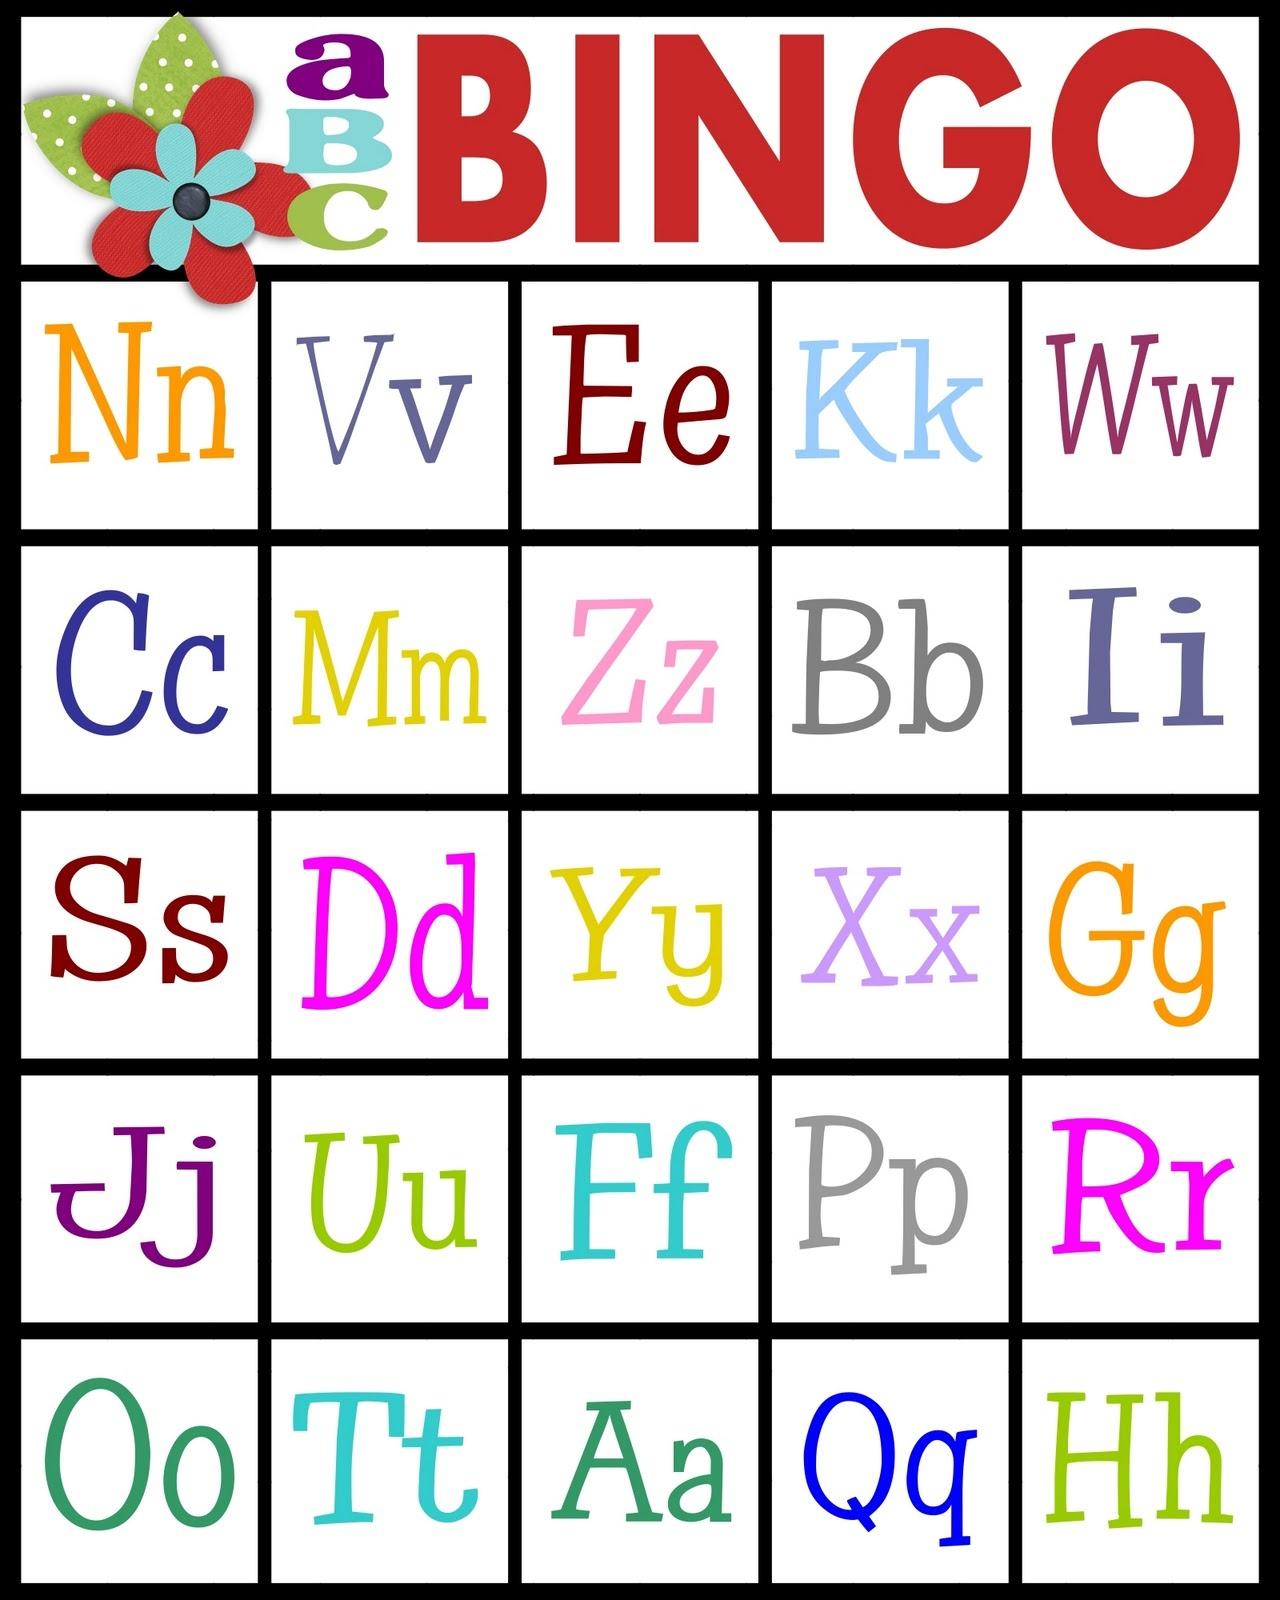 Sassy Sanctuary: Abc's Bingo- Free Printable! - Free Printable Alphabet Board Games